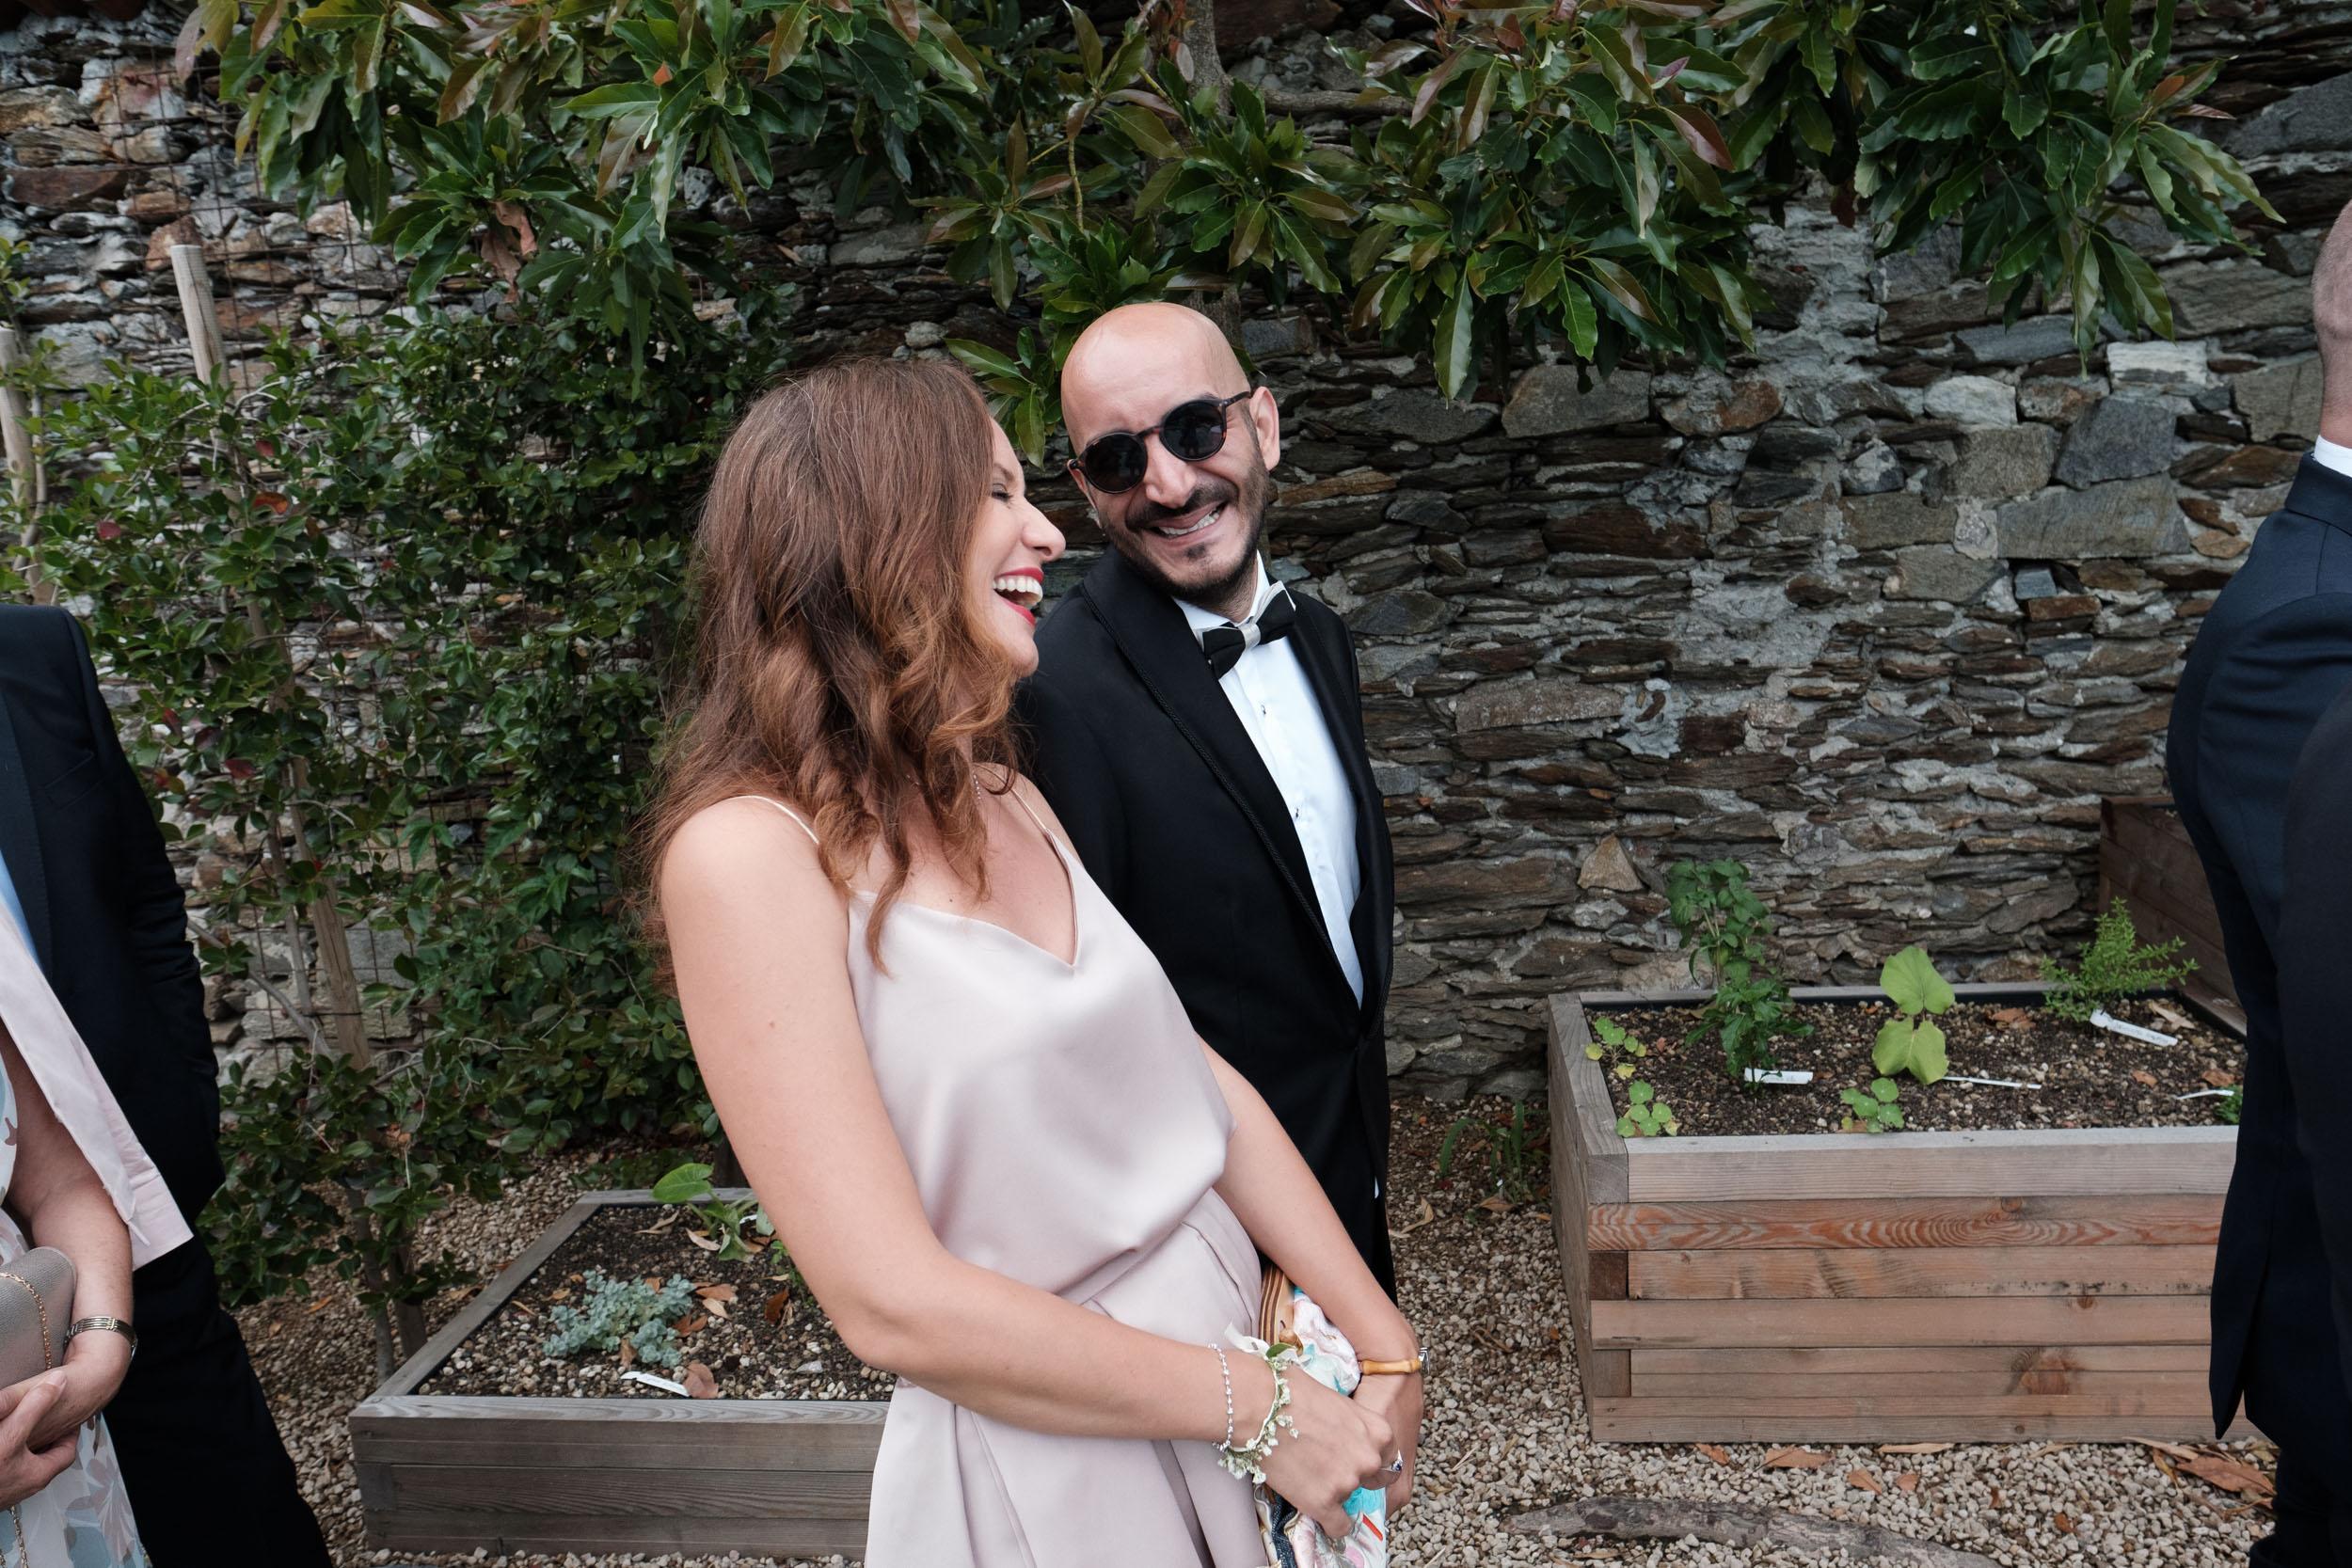 olivia-andreas-wedding-switzerland-346.jpg